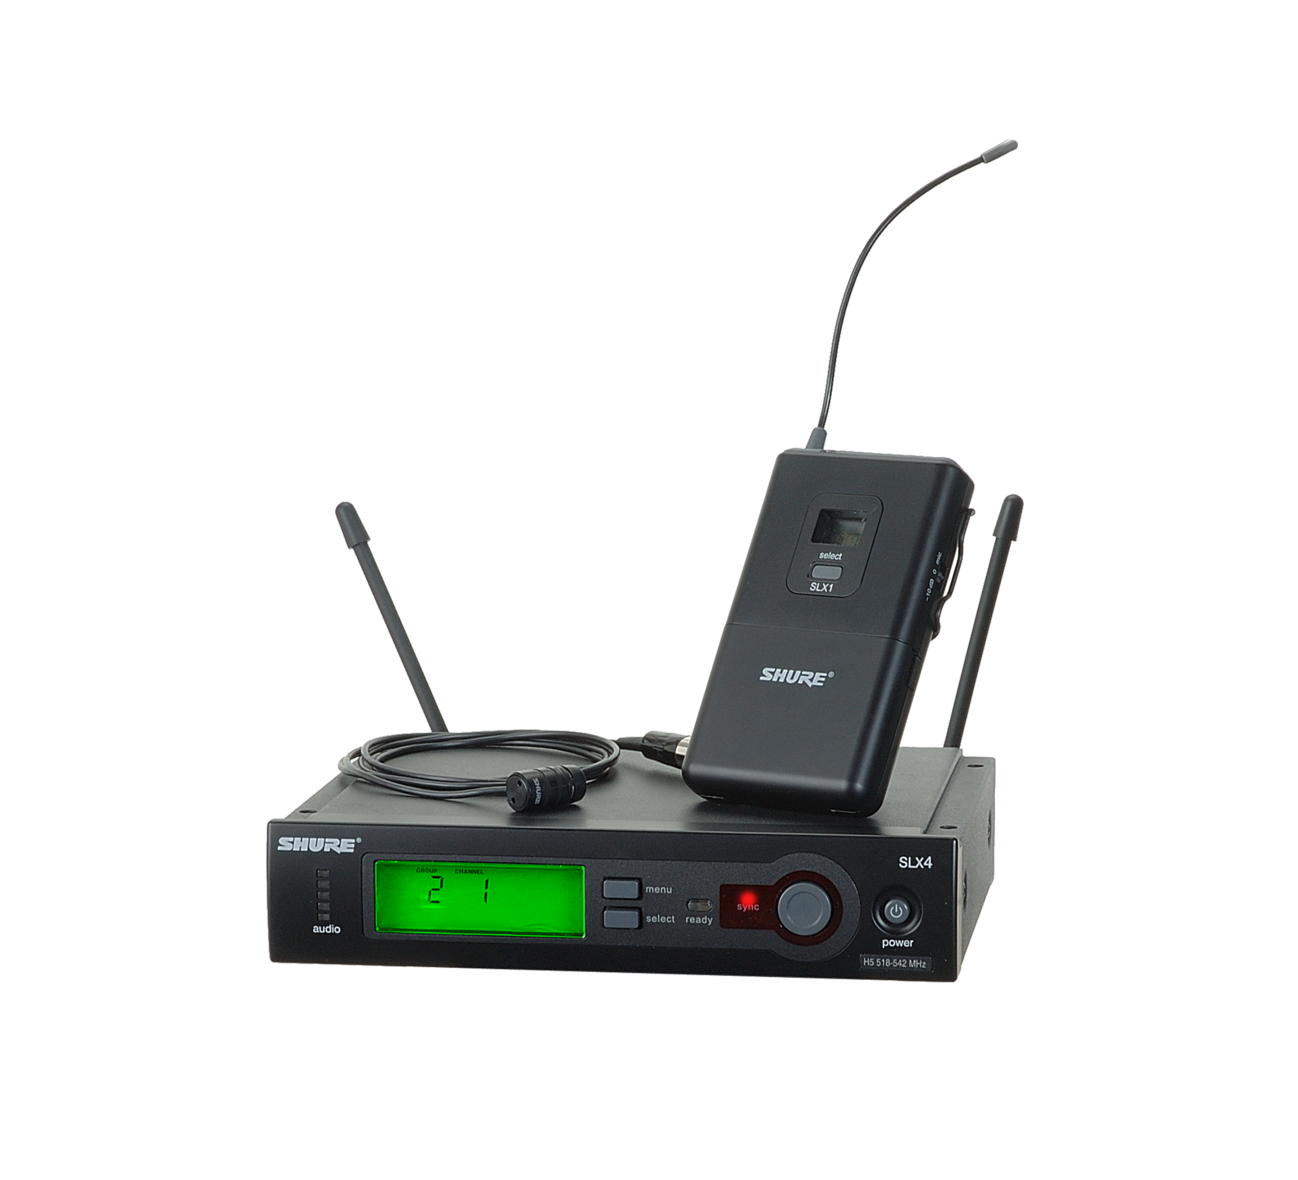 #清貨 #全新 Shure SLX14/85 Wireless System with WL185 Lavalier Microphone #有保養